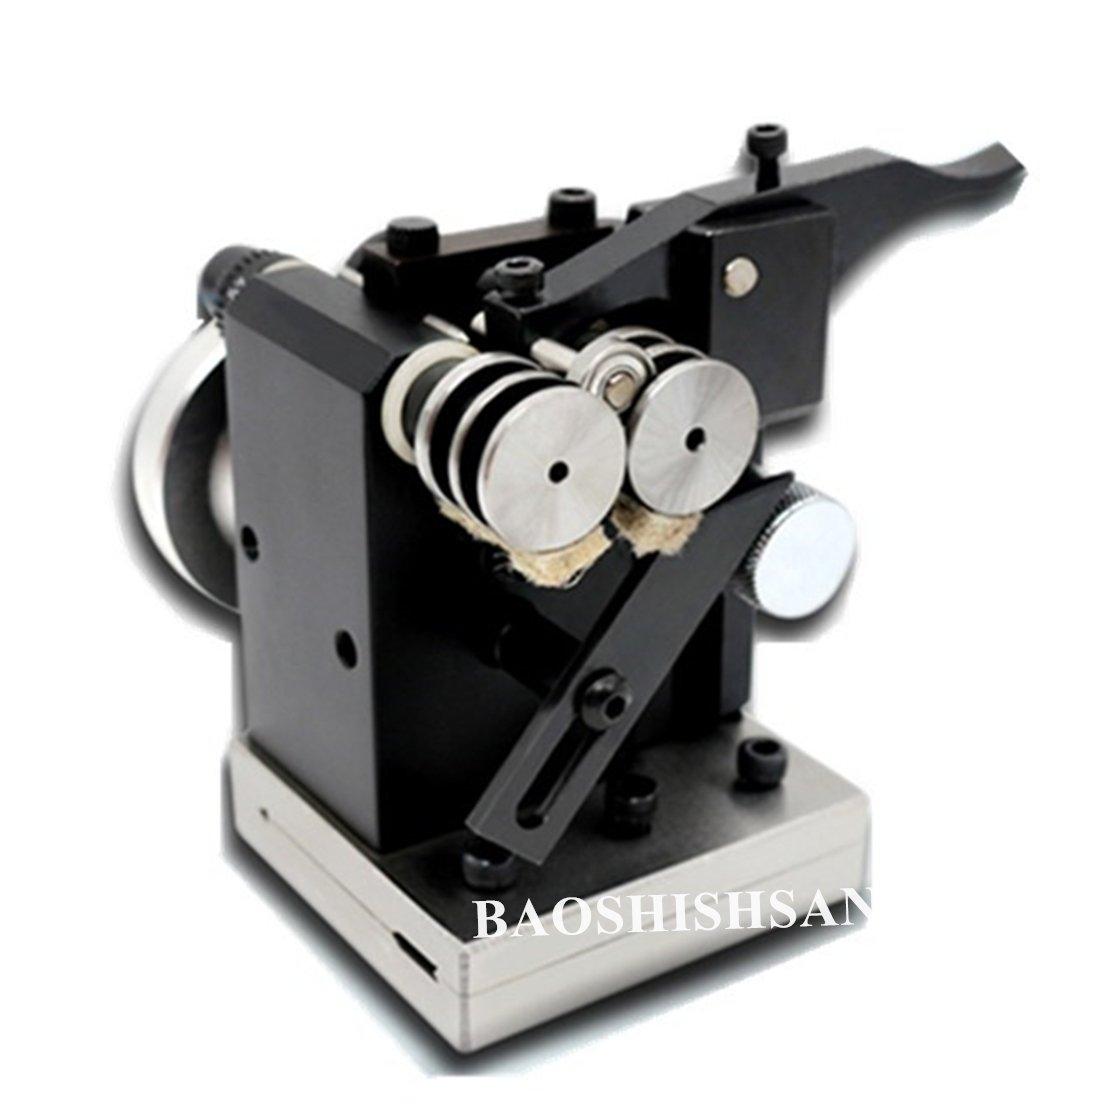 PGAS Mini Punch Grinding Machine High Precision Punch Grinder Needle Grinding Machine with SUS440 Material